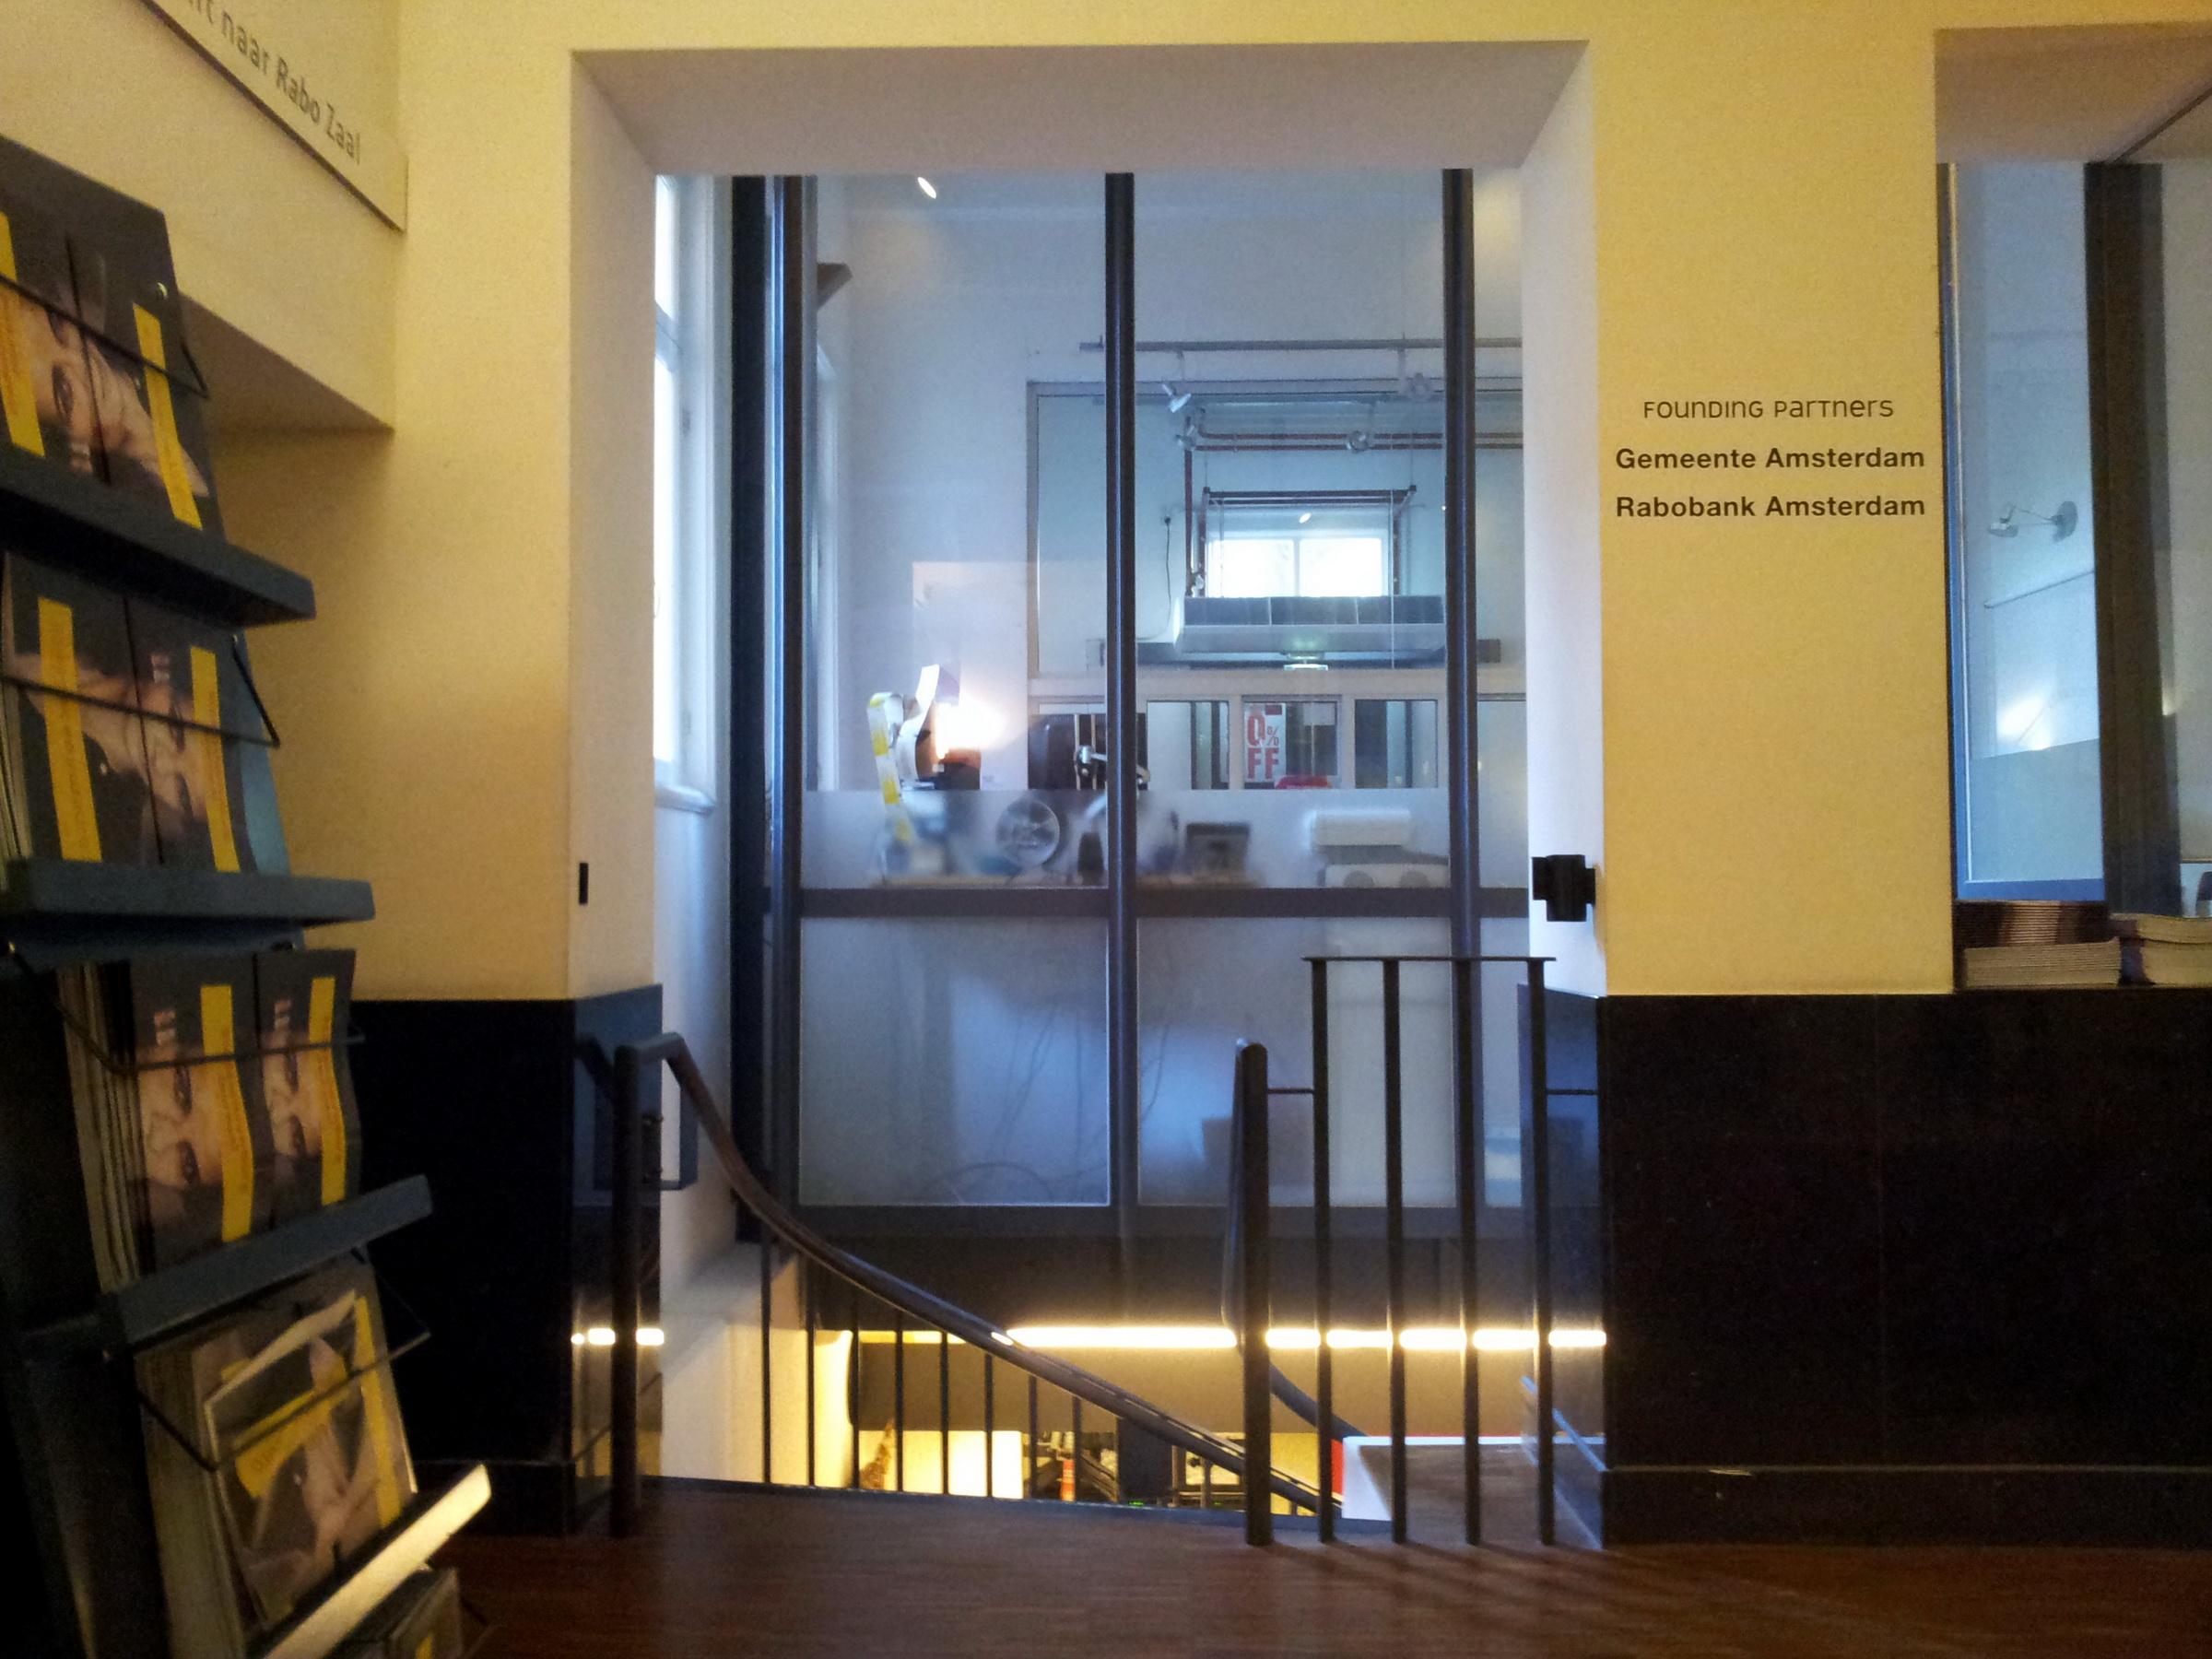 File:amsterdam stadsschouwburg entreehal kassa en trap naar